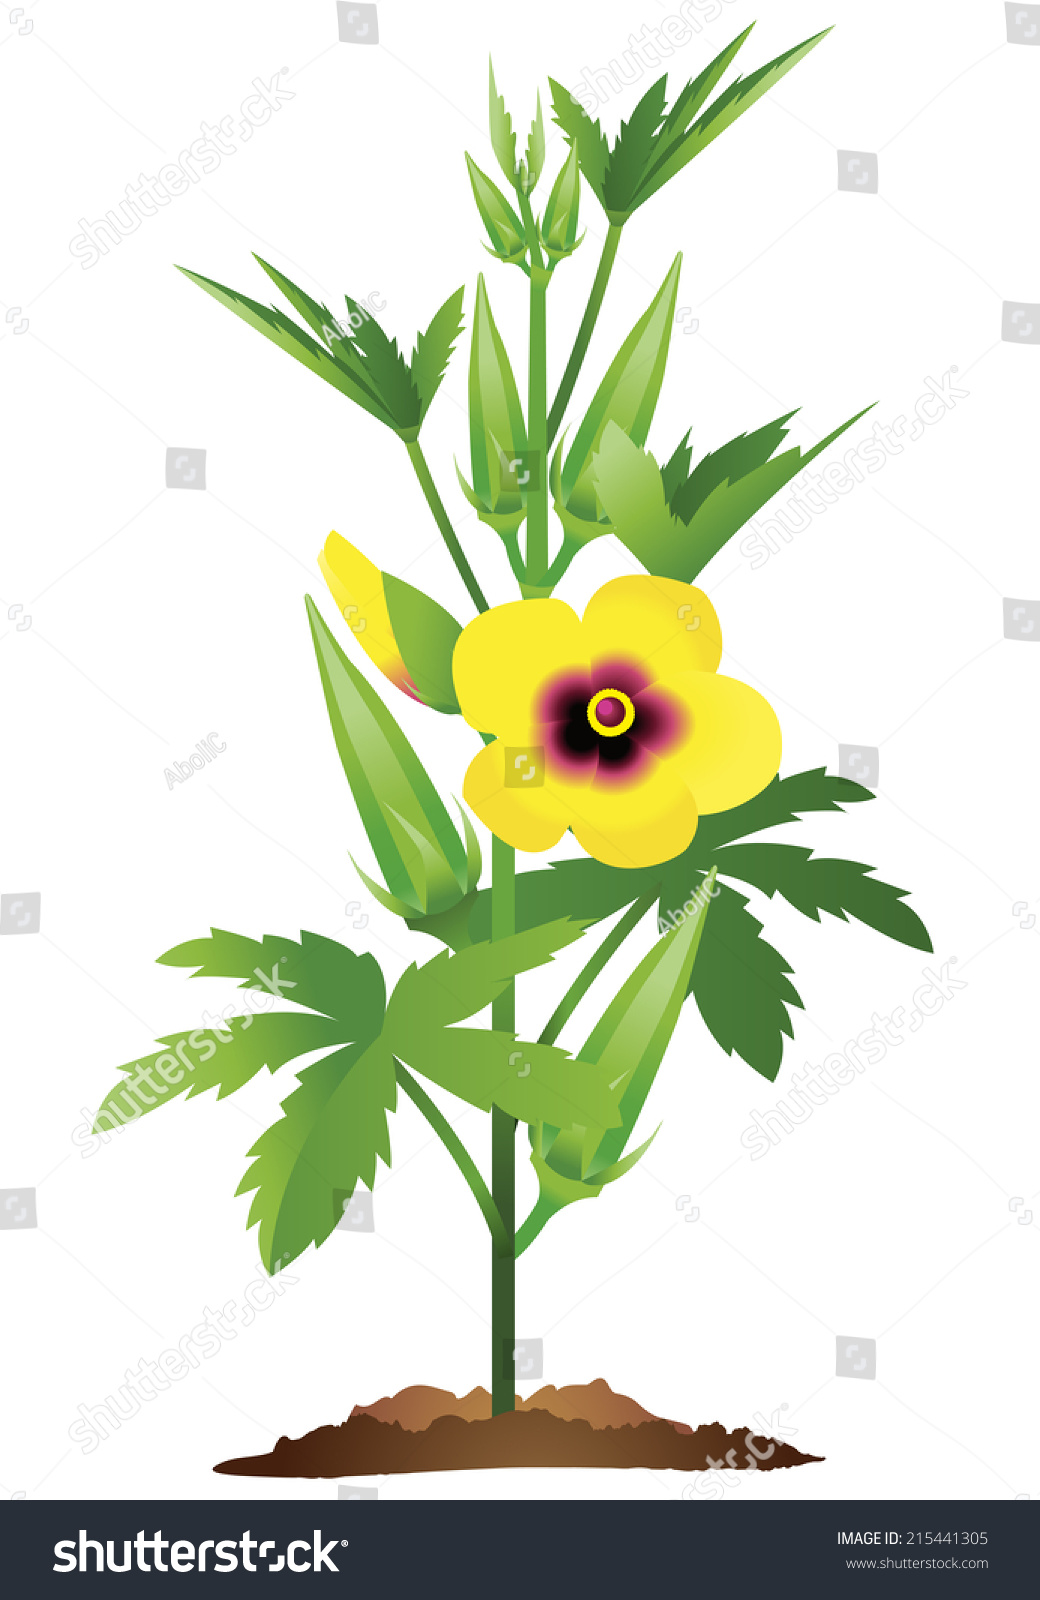 fully grown okra plant okra flowers stock vector 215441305